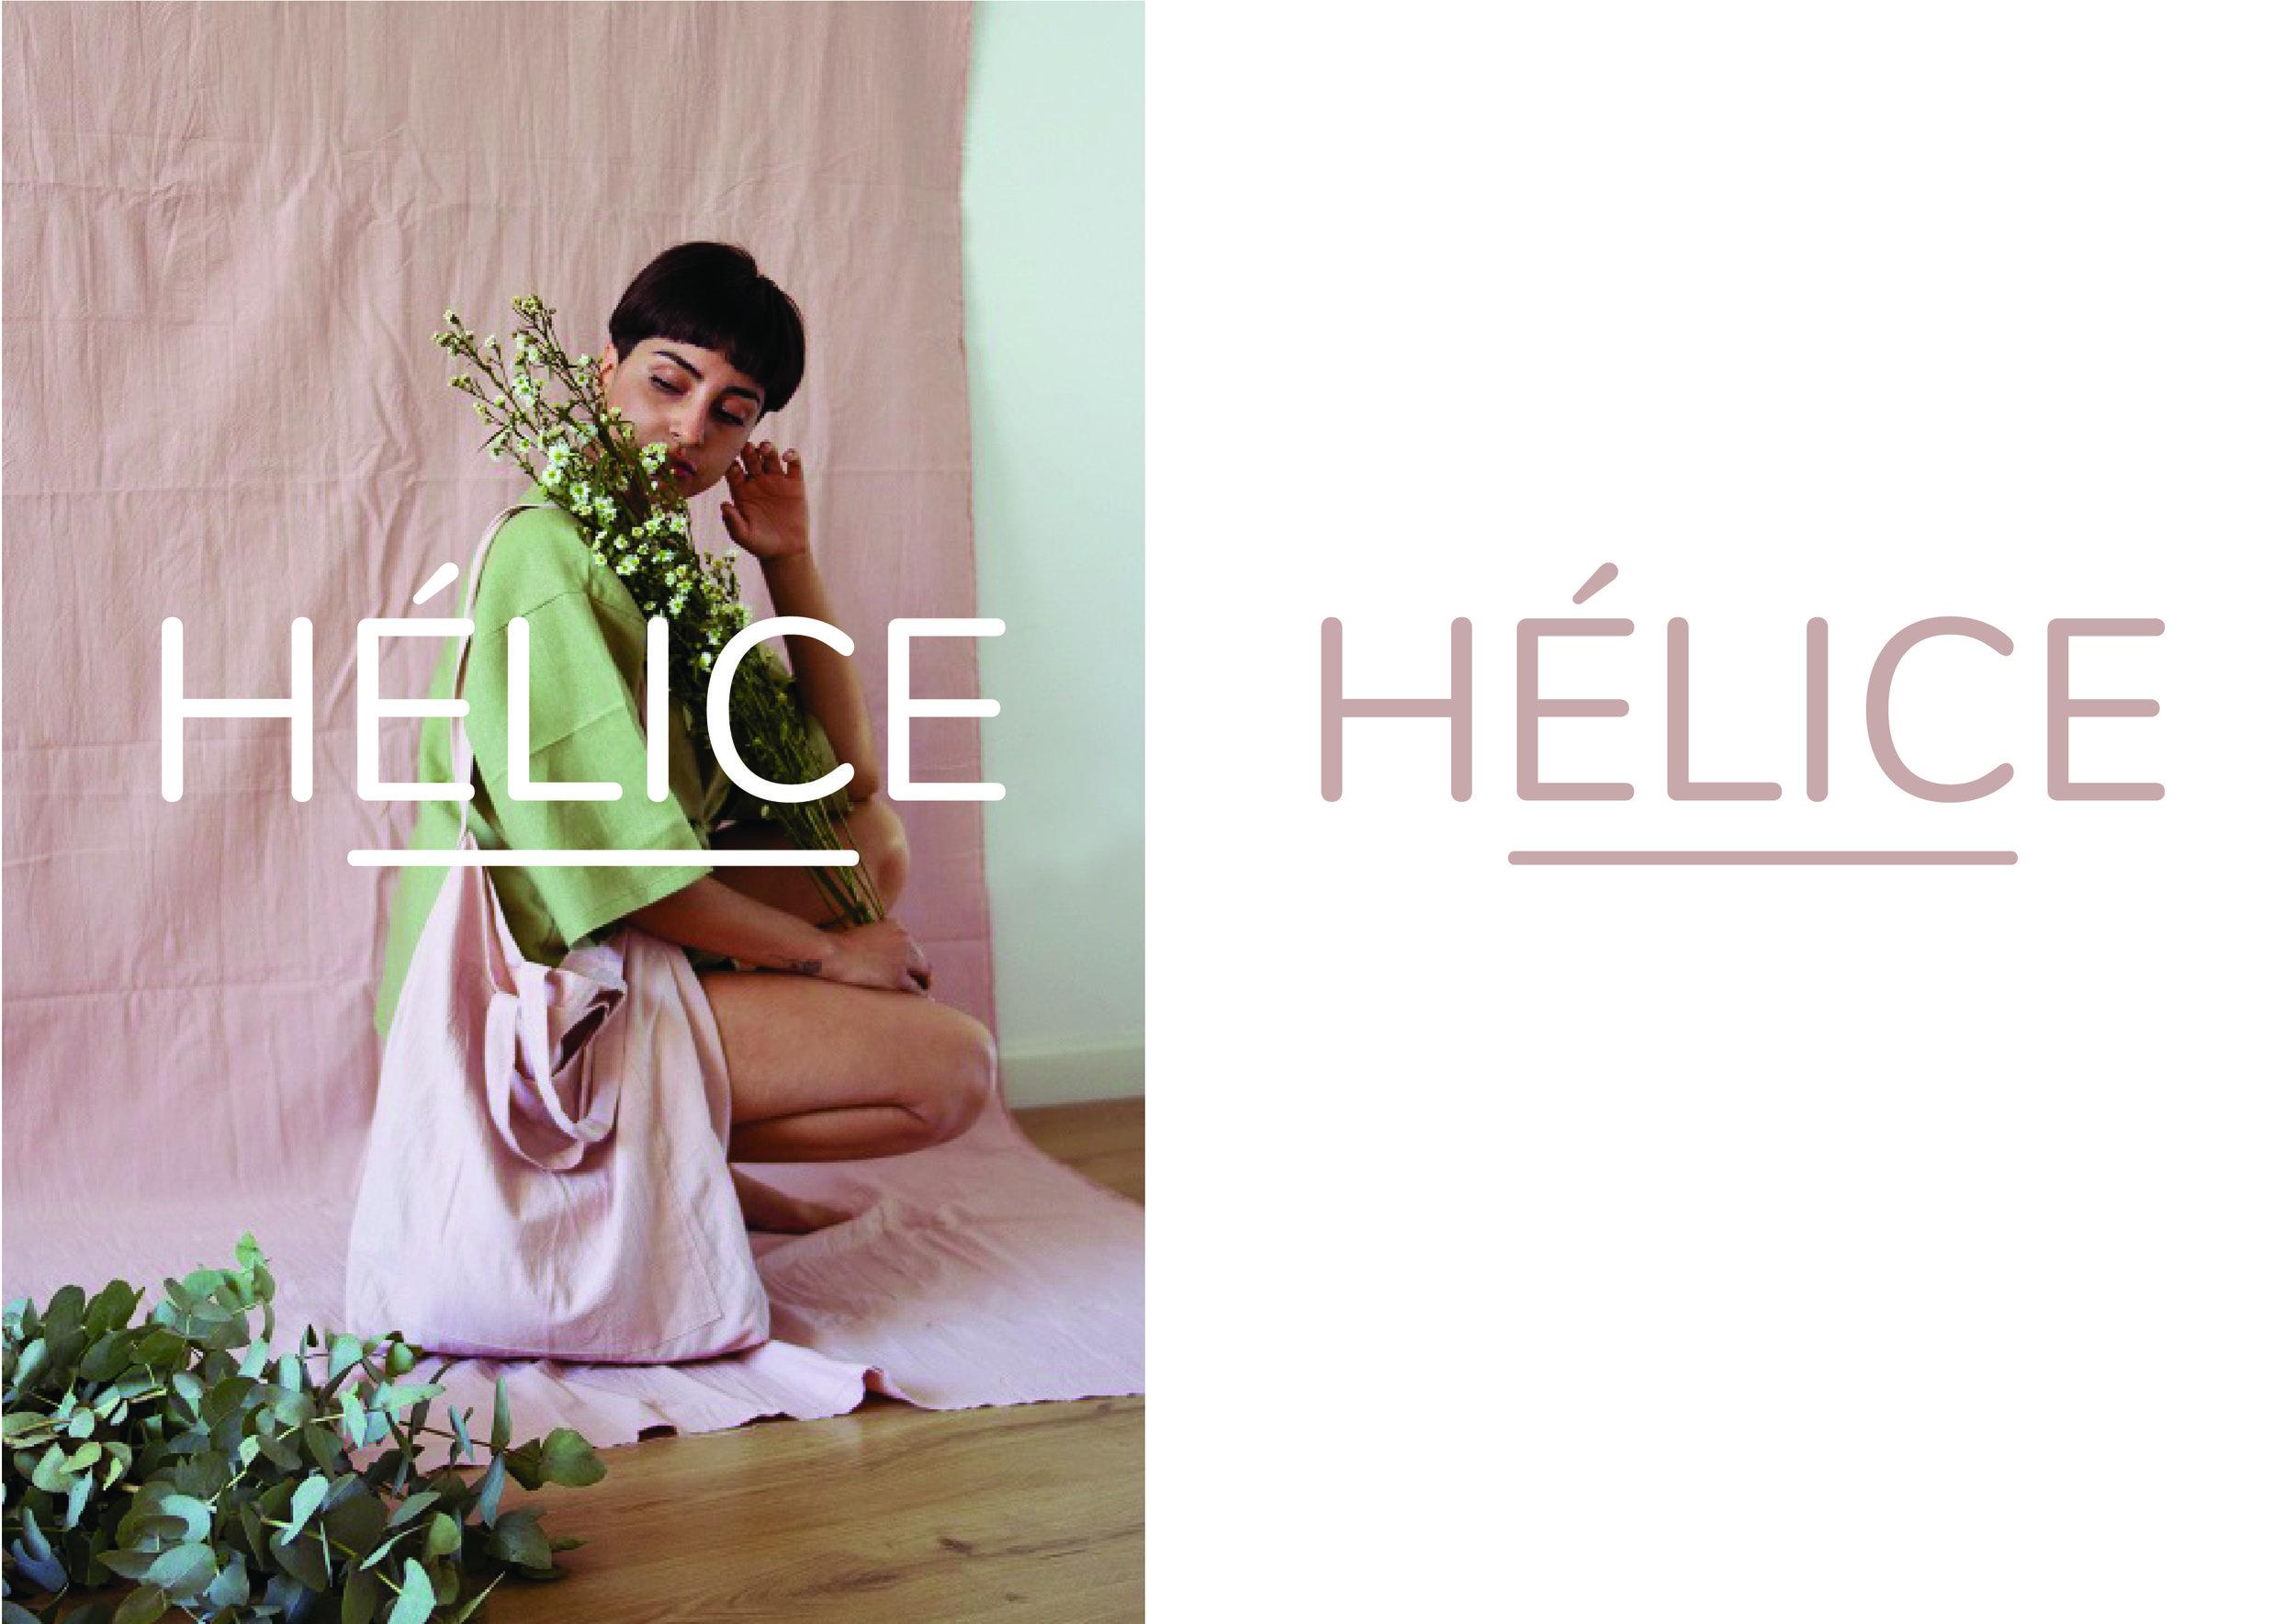 helice-05.jpg